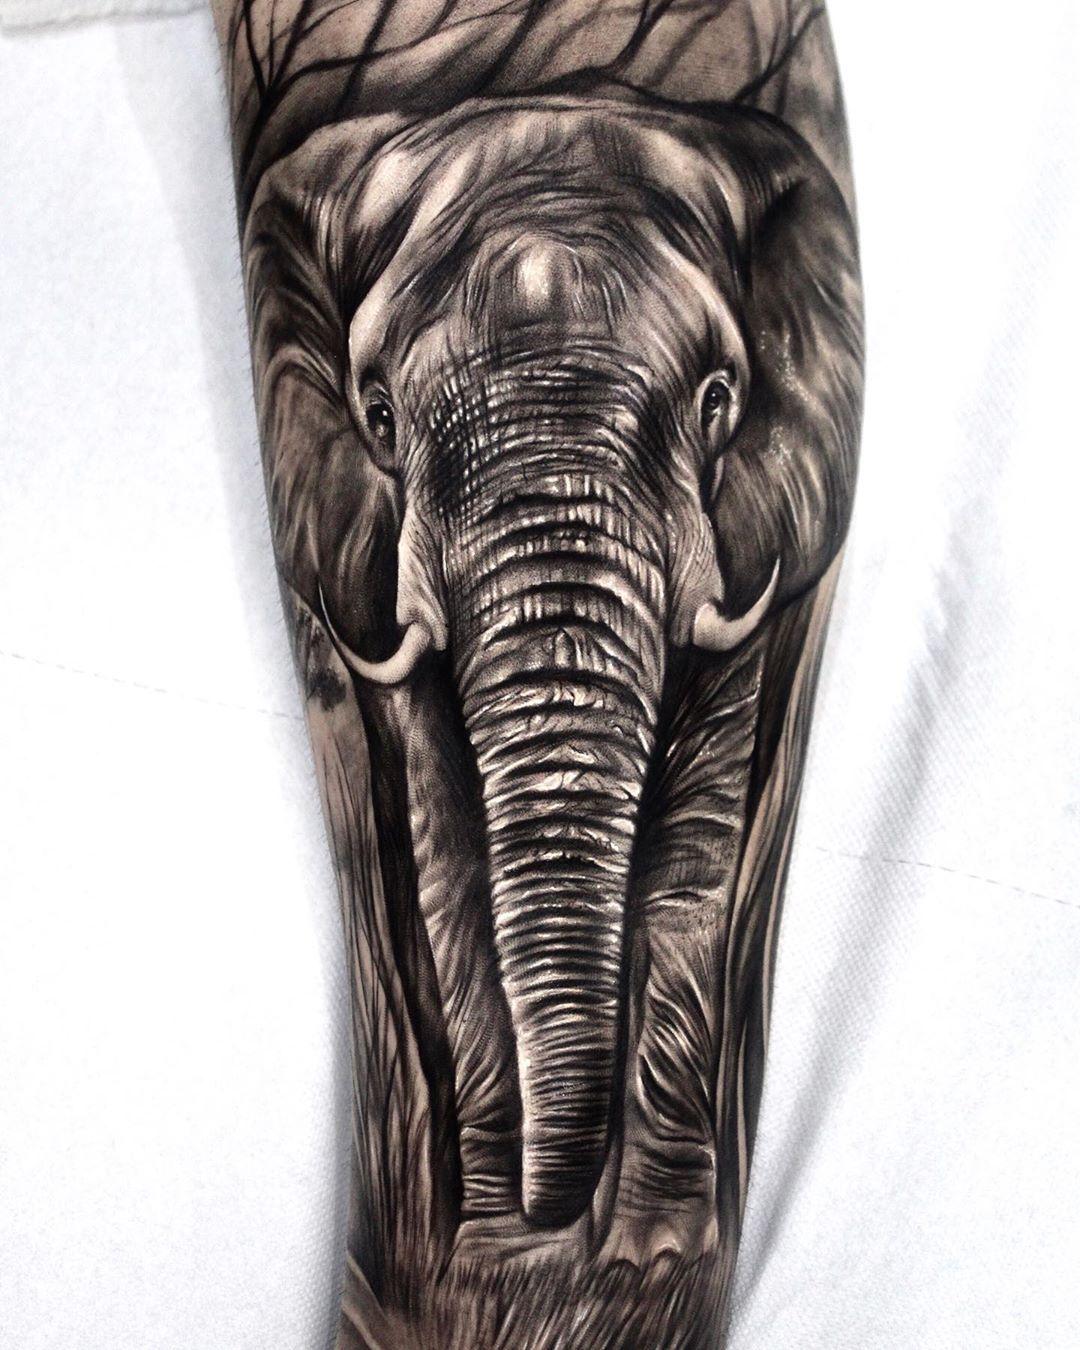 Elephant!! Full leg in progress! @cheyenne_tattooequipment @stencilstuff @cg.tattoostudio @dynamiccolor @hustlebutterdeluxe @100celletattoosupply #tattoo #tattoos #animaltattoo #portrait #familytattoo #elephant #elephanttattoo #savanatattoo #safari #safariphotography #realistictattoo #realistic #blackandgreytattoo #blackandgrey #realism #tattooroma #roma #cgtattoostudio